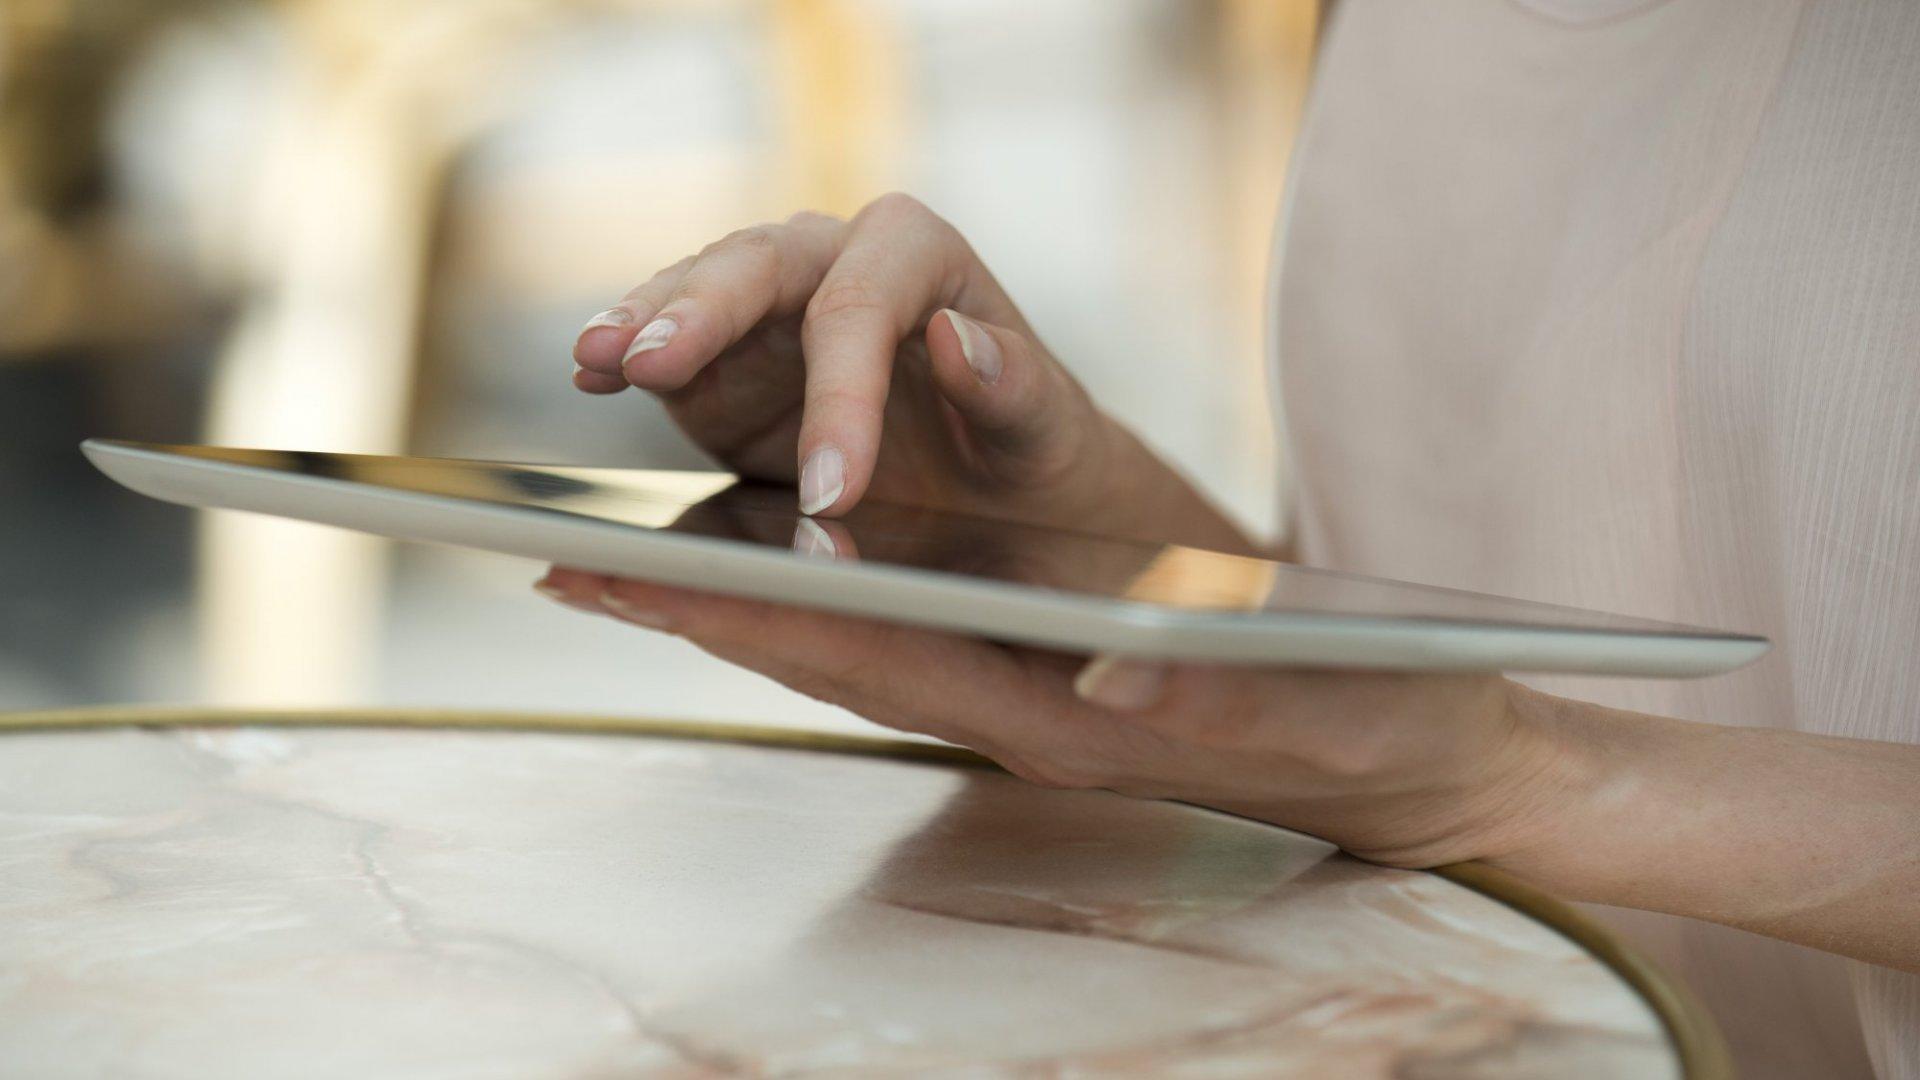 5 Ways to Make Social Media a Mindset, Not a Tool